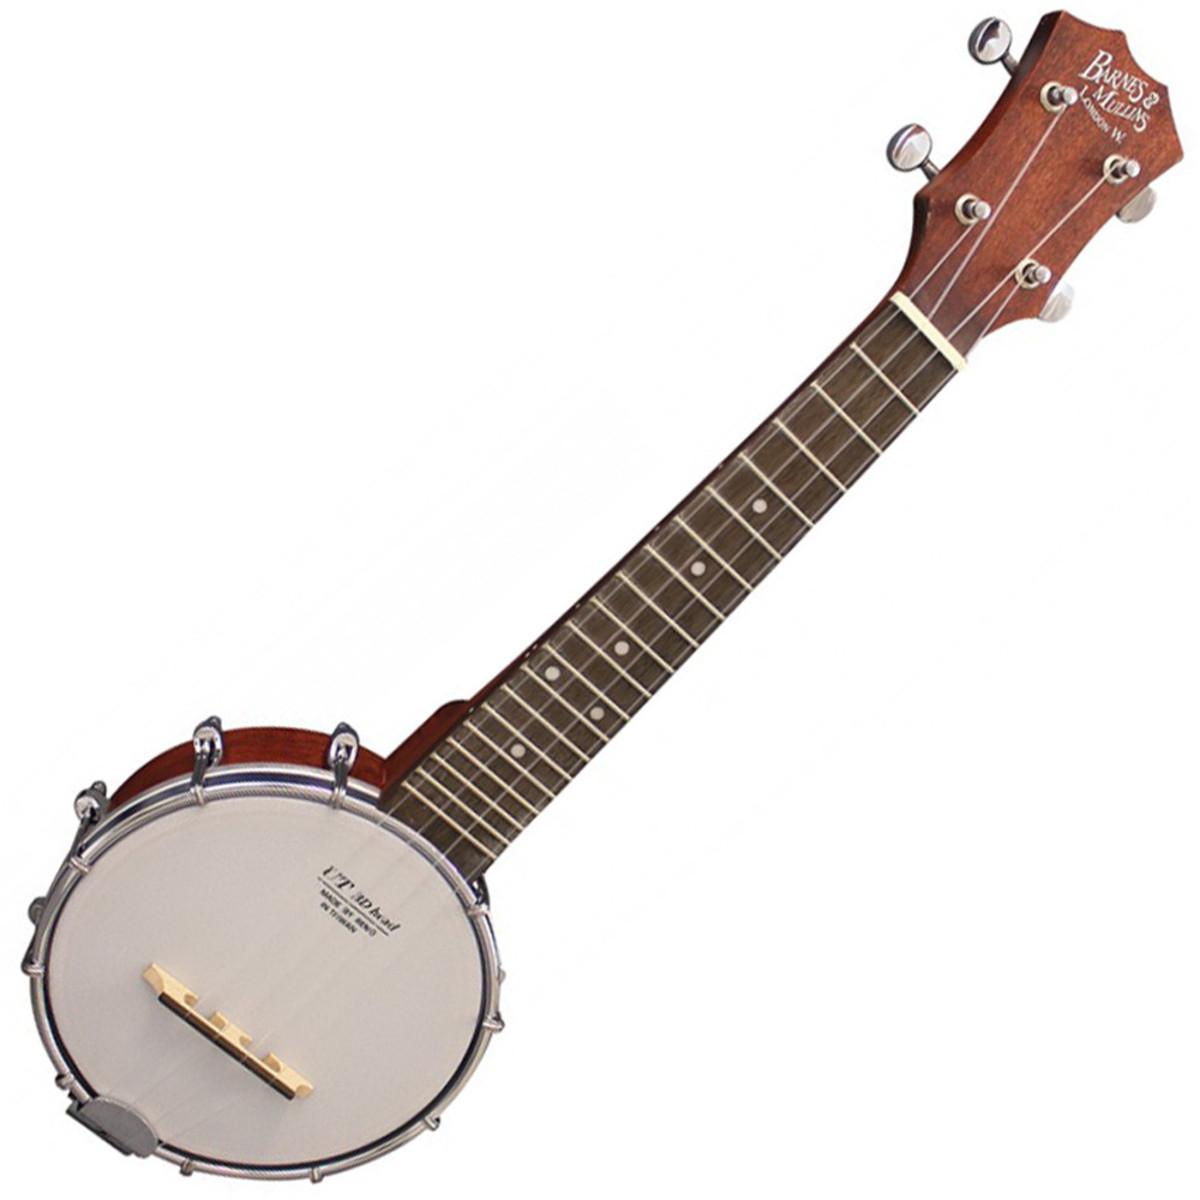 Barnes and Mullins Ukulele Banjo for sale   Red Cow Music ...